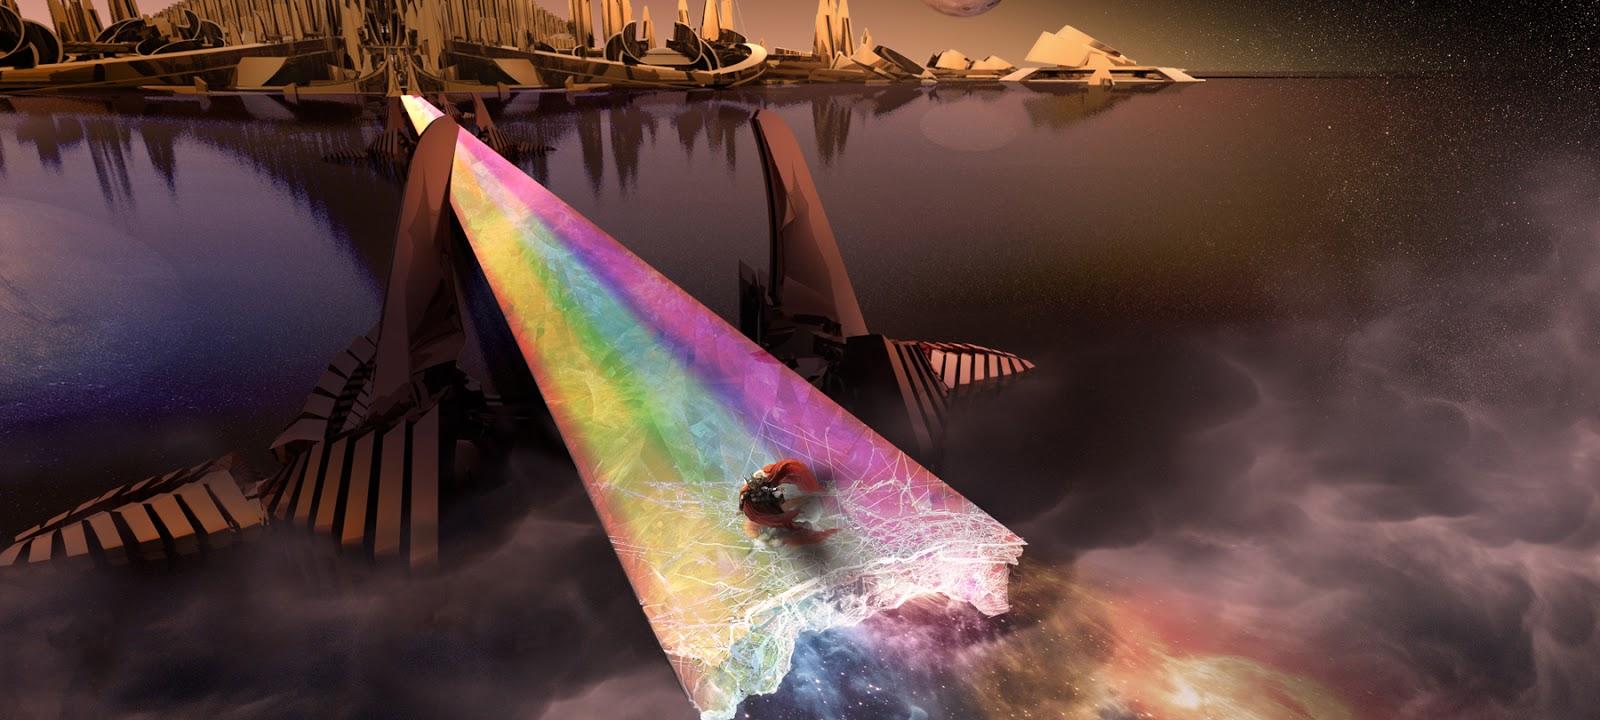 Astonishing Thor Concept Art By Vance Kovacs 171 Film Sketchr